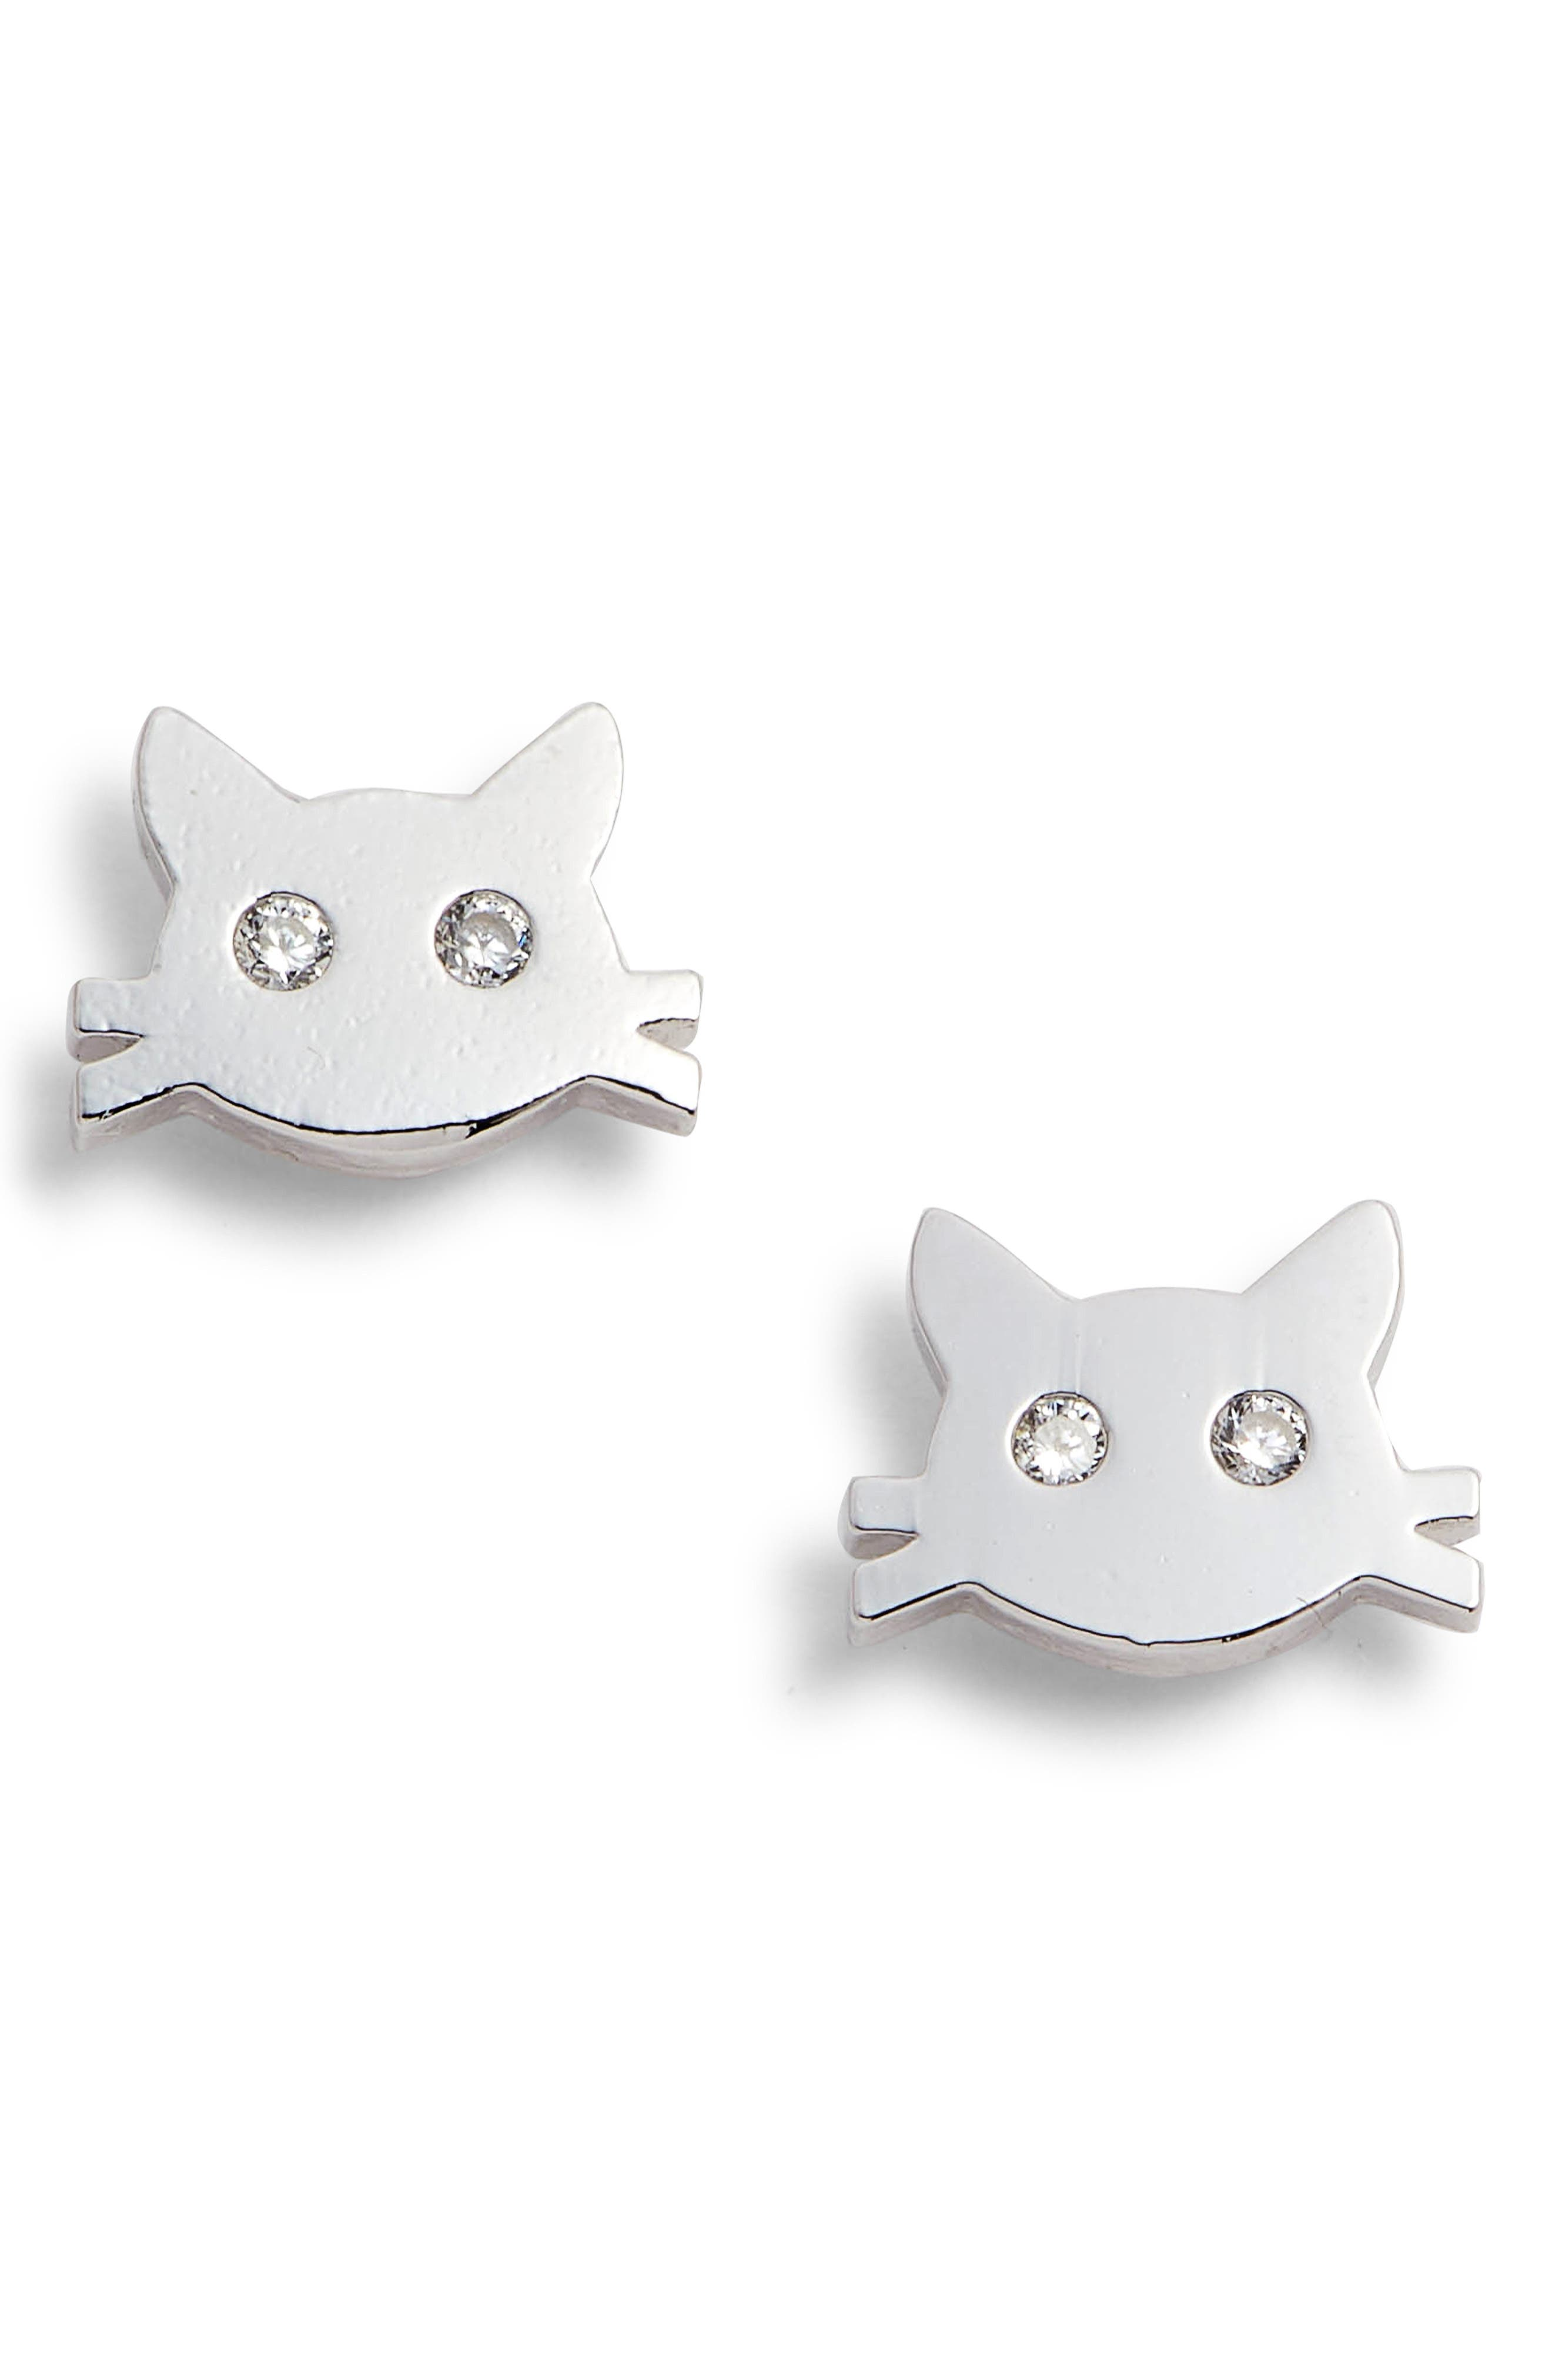 Crystal Cat Stud Earrings,                             Main thumbnail 1, color,                             SILVER